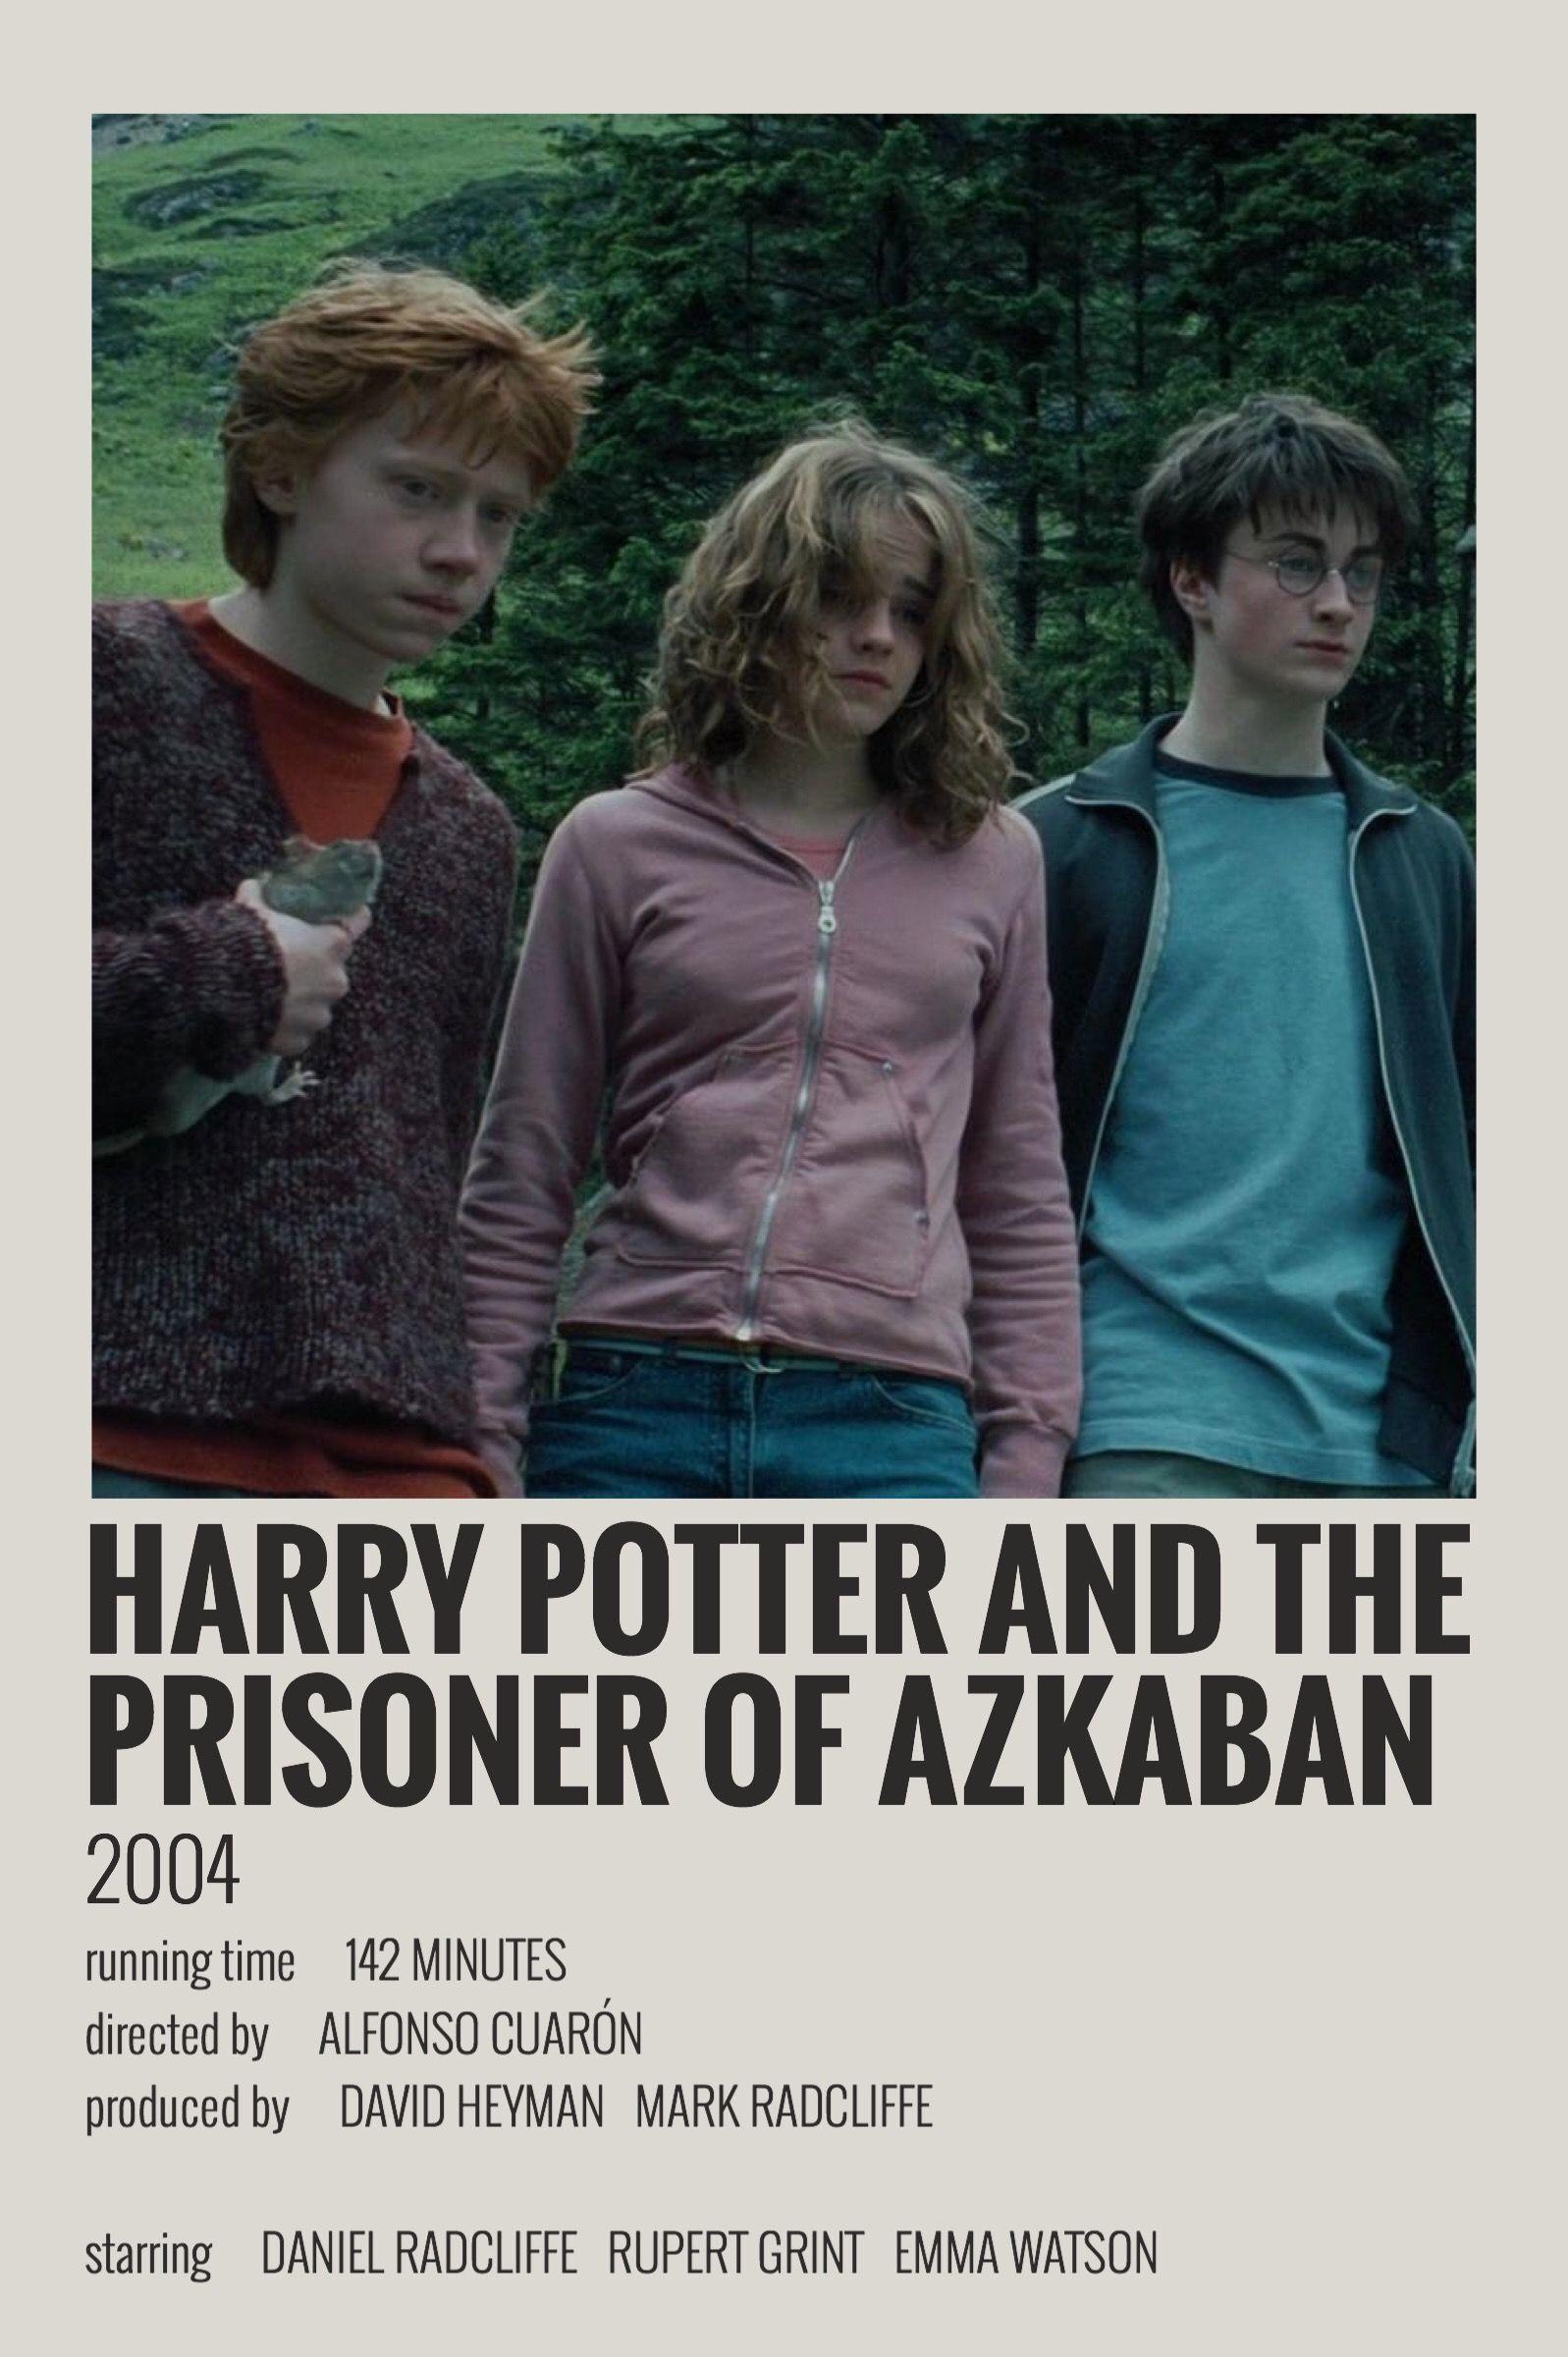 Harry Potter By Maja Harry Jugendfilm Maja Potter Film Posters Minimalist Indie Movie Posters Movie Posters